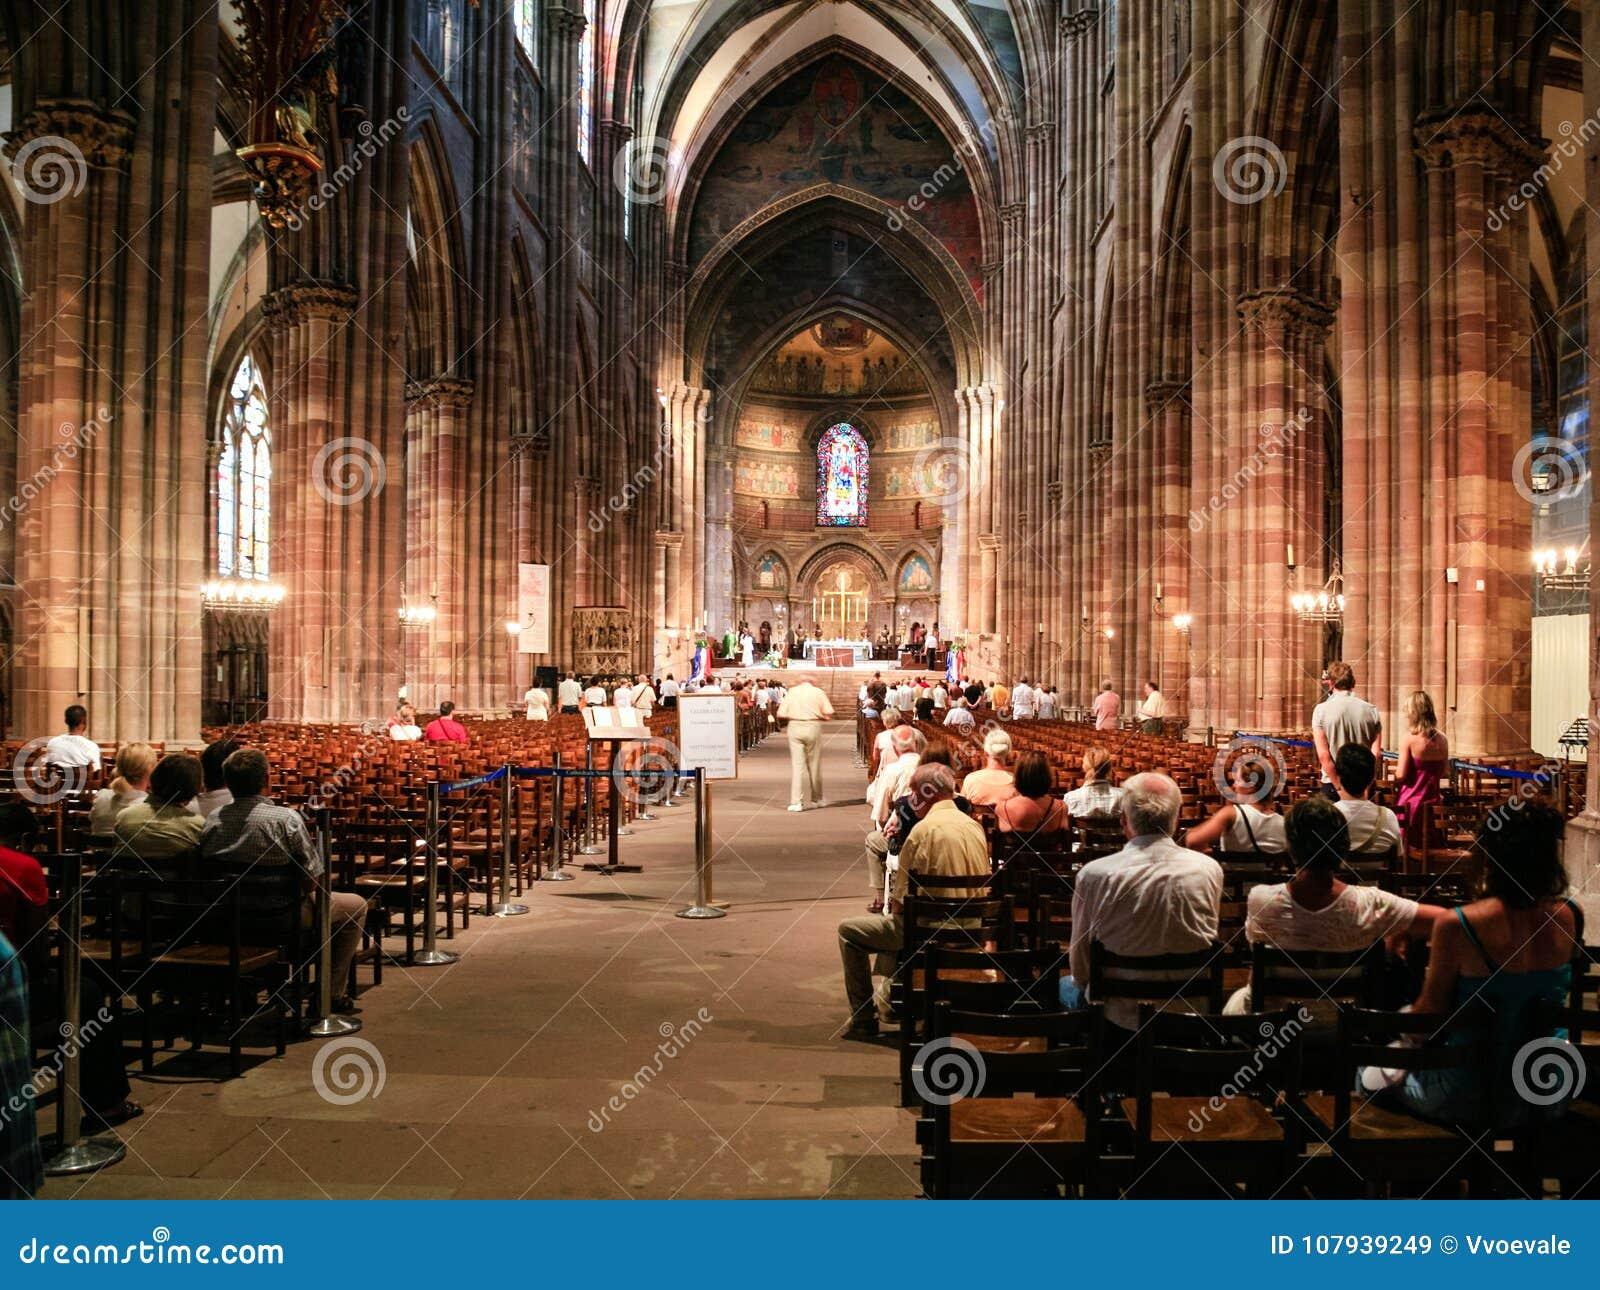 Church service in Strasbourg Cathedra